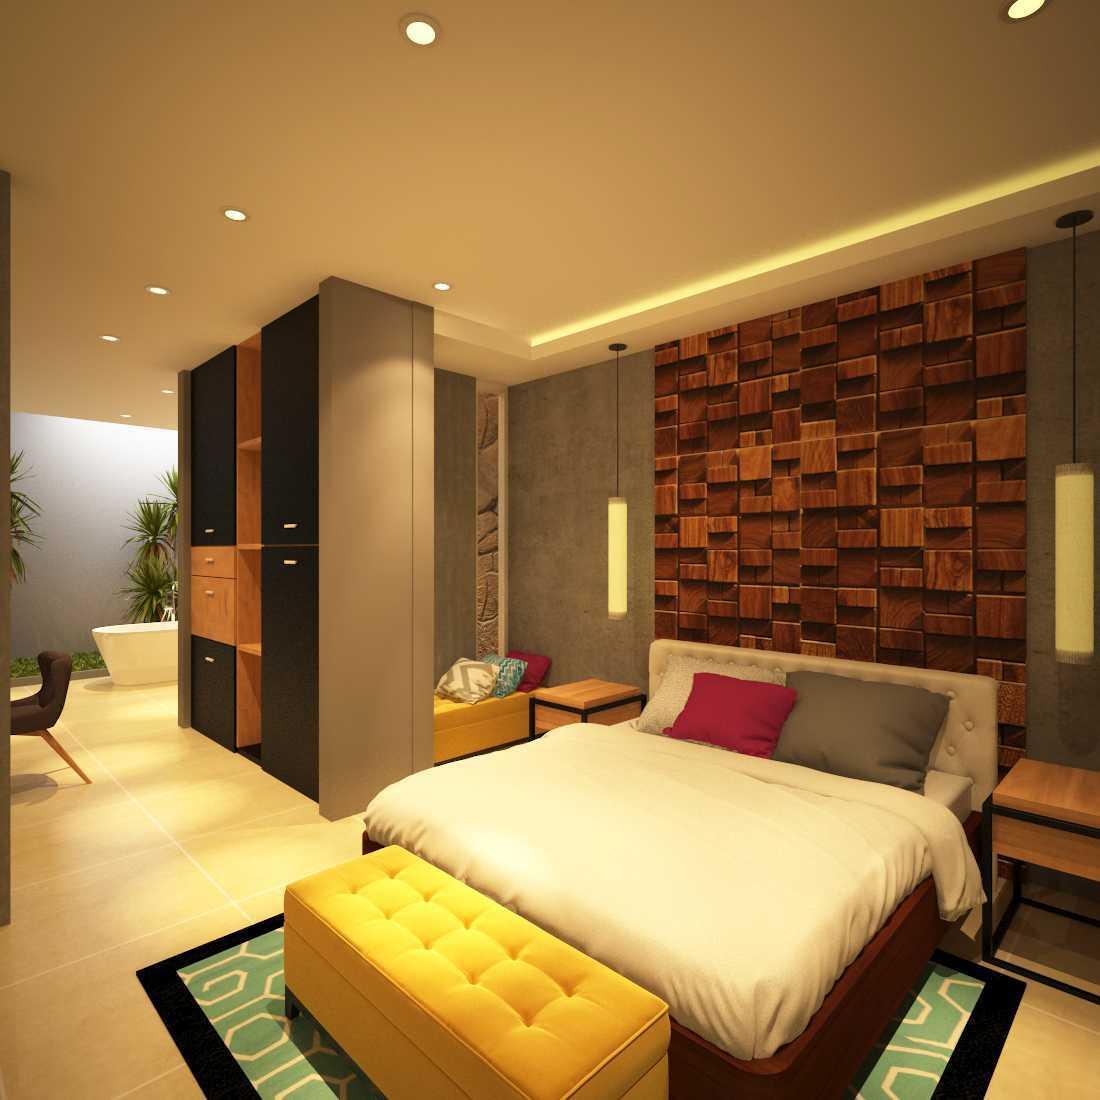 Sense Studio Villa - Bpk Rudy Bali, Indonesia Bali, Indonesia Sense-Studio-Villa-Bpk-Rudy Kontemporer  51638